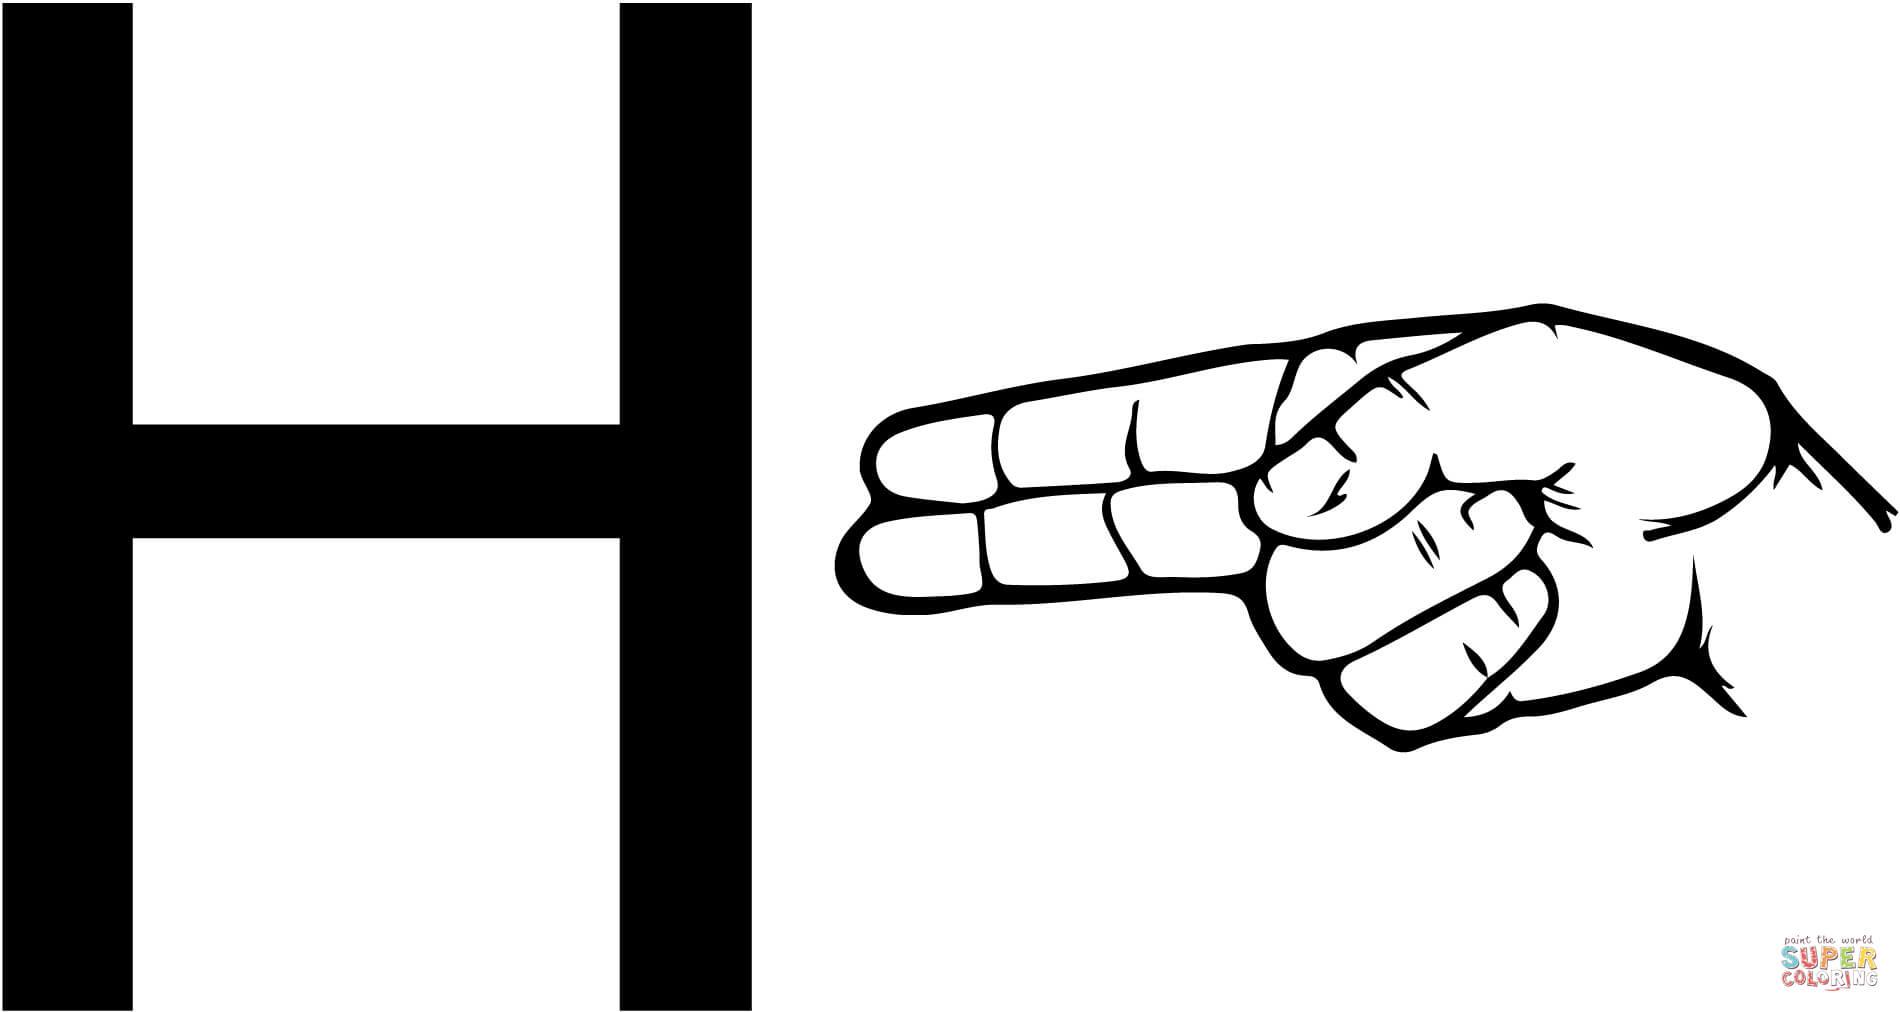 Wiring Diagram Signs